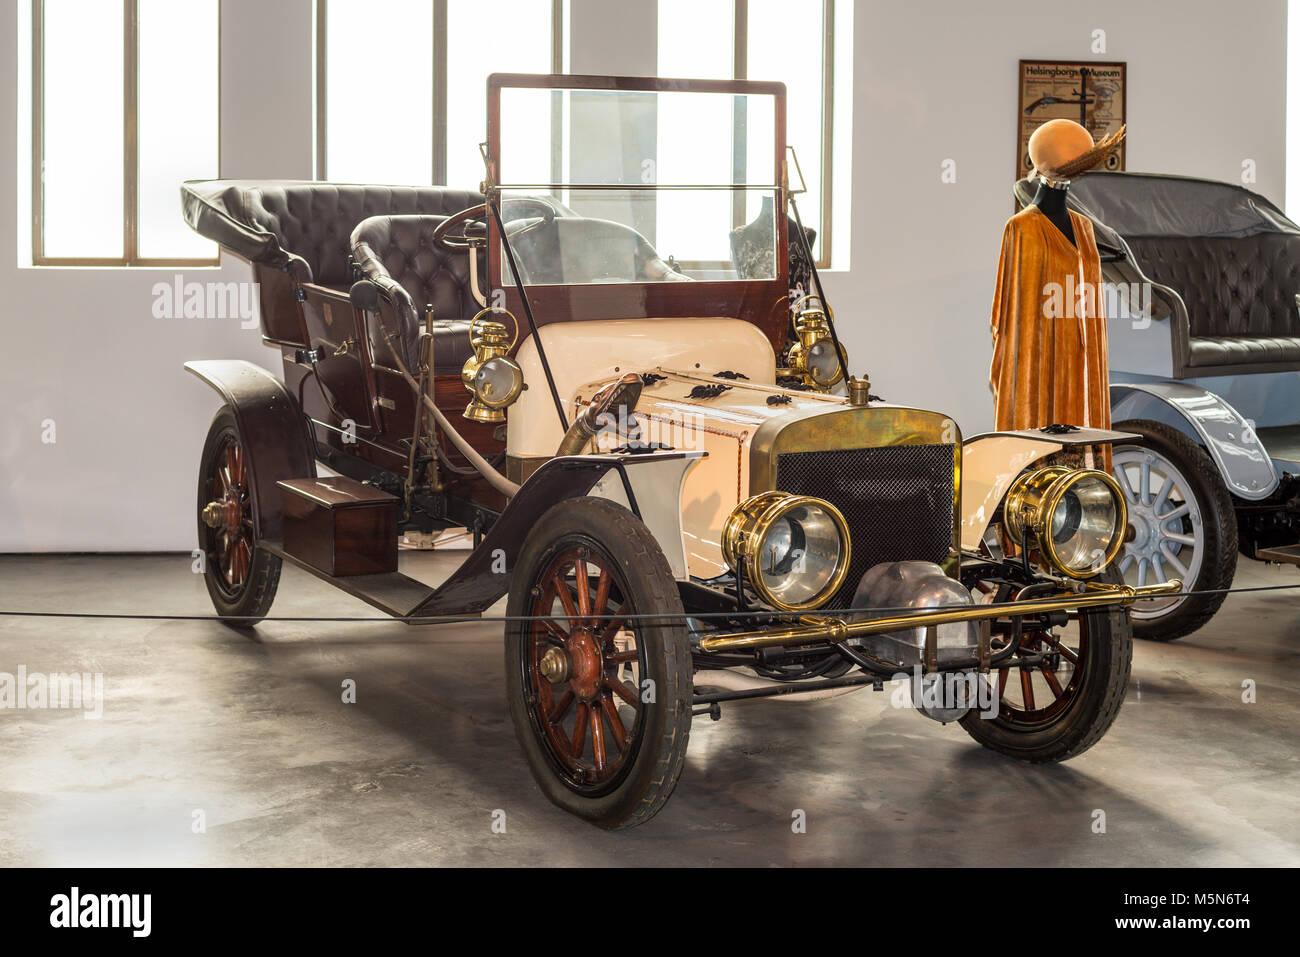 Malaga, Spain - December 7, 2016: Vintage Antique 1906 Jackson USA car displayed at Malaga Automobile Museum in - Stock Image